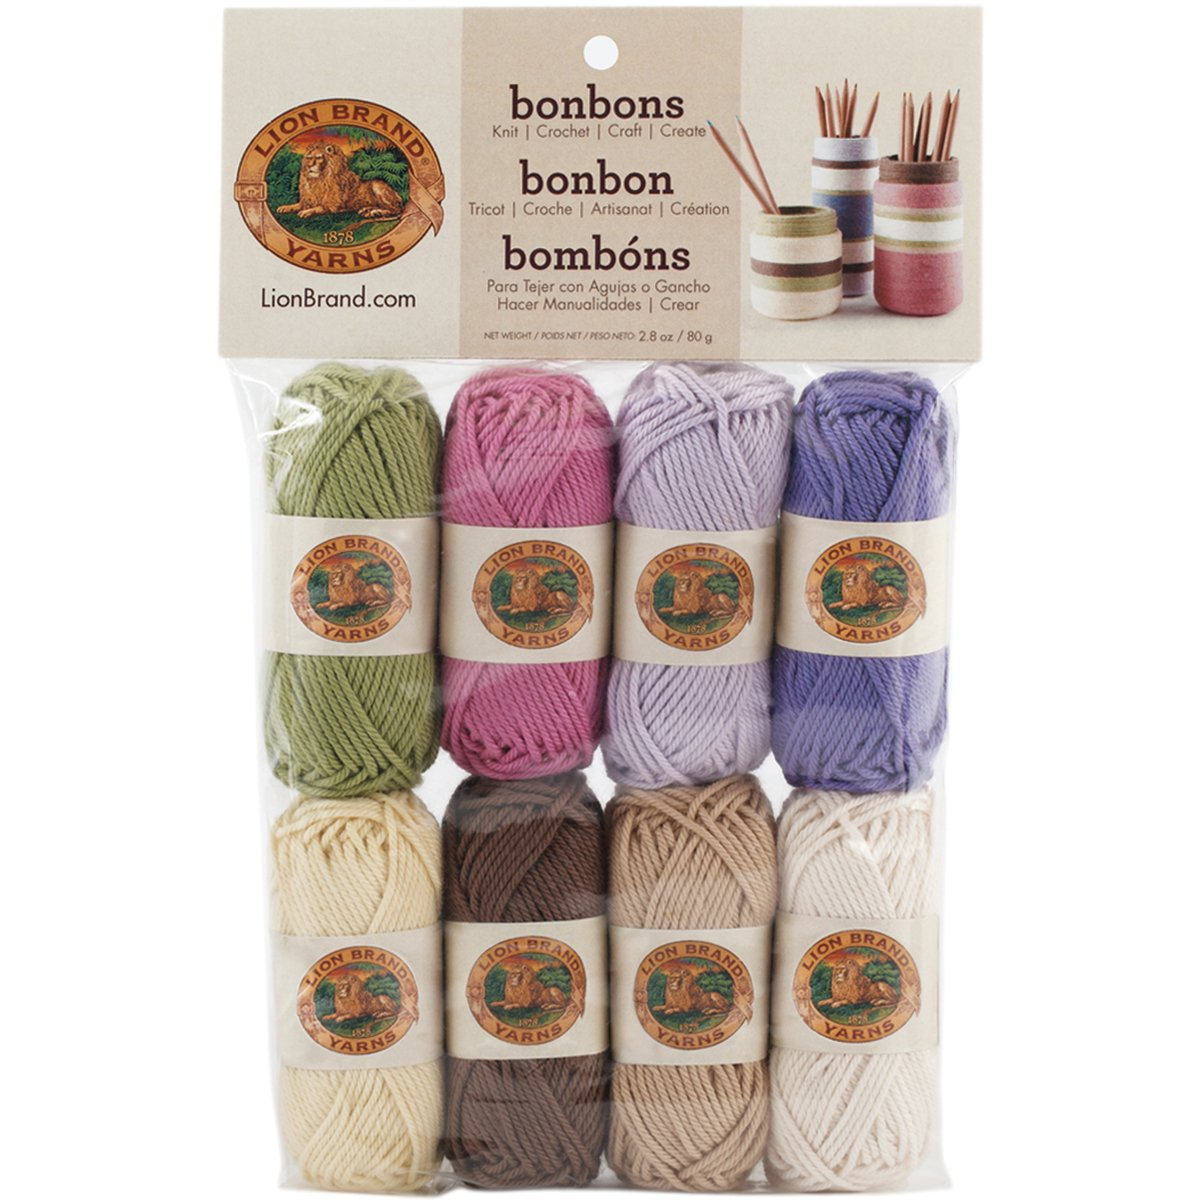 Lion Brand Yarn 601-640 Bonbons Yarn, Nature